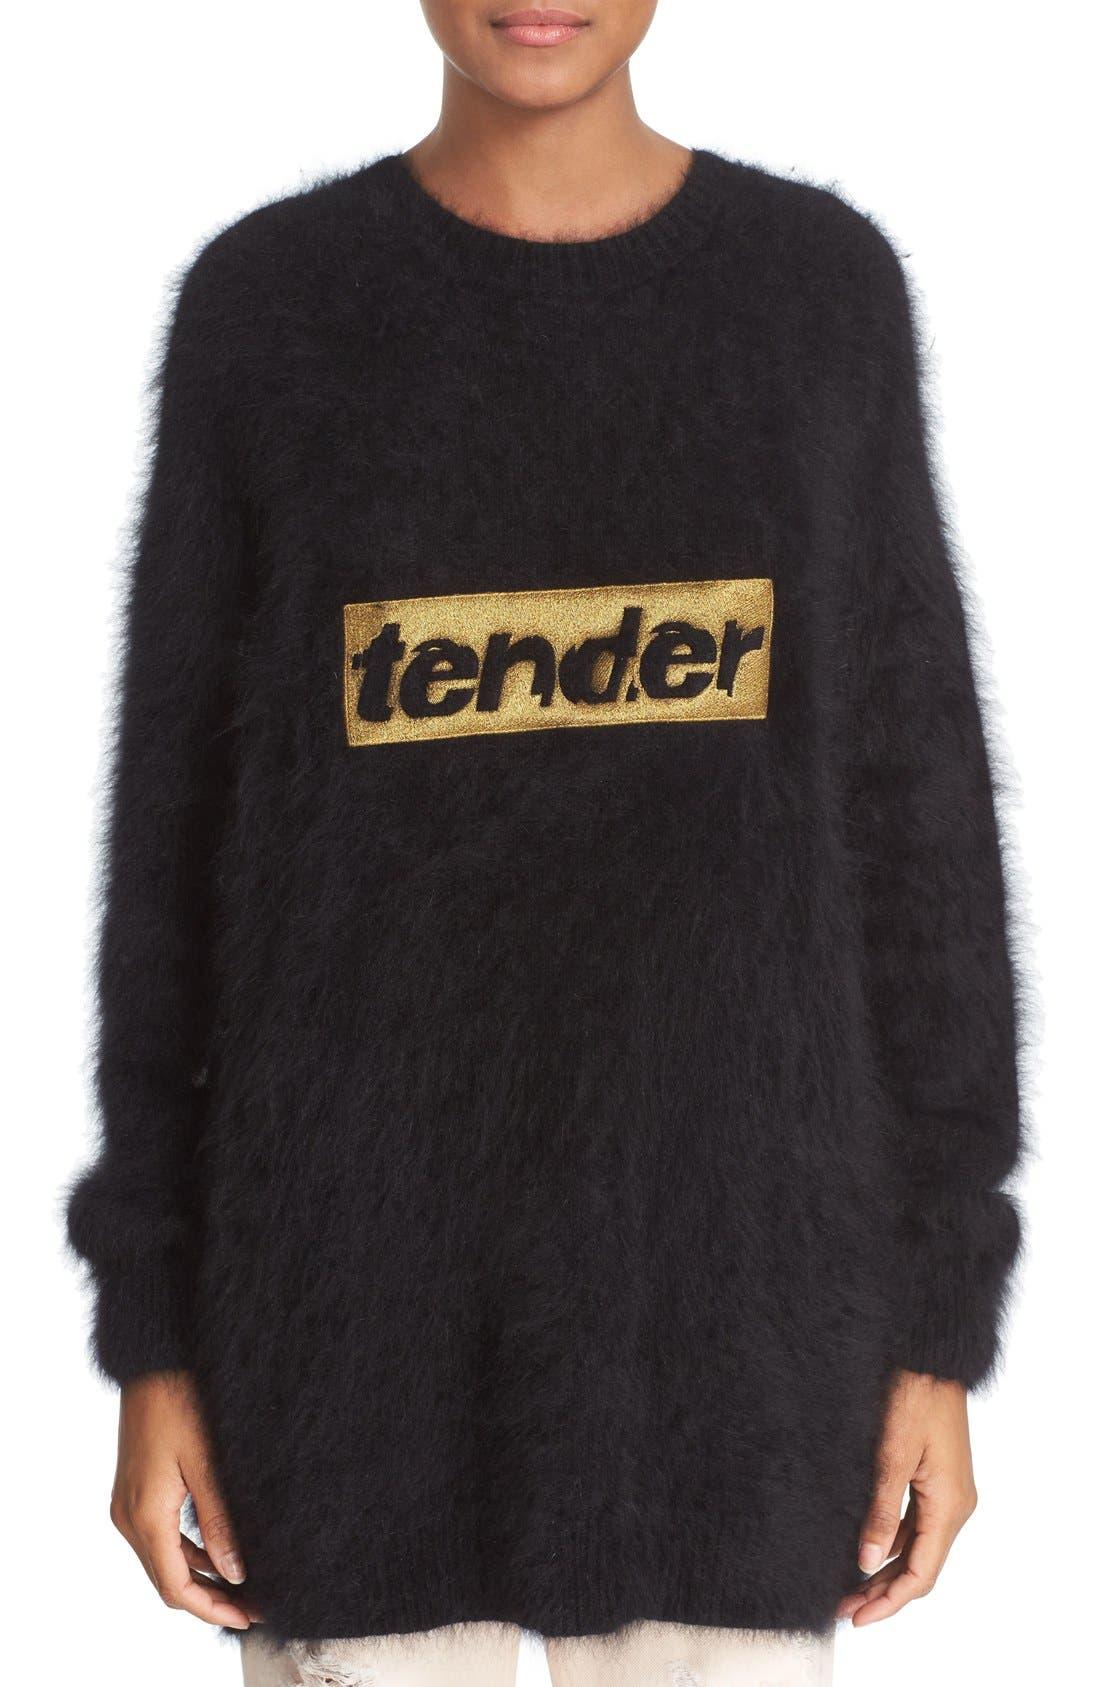 Alternate Image 1 Selected - Alexander Wang 'Tender' Embroidered Wool Blend Sweater